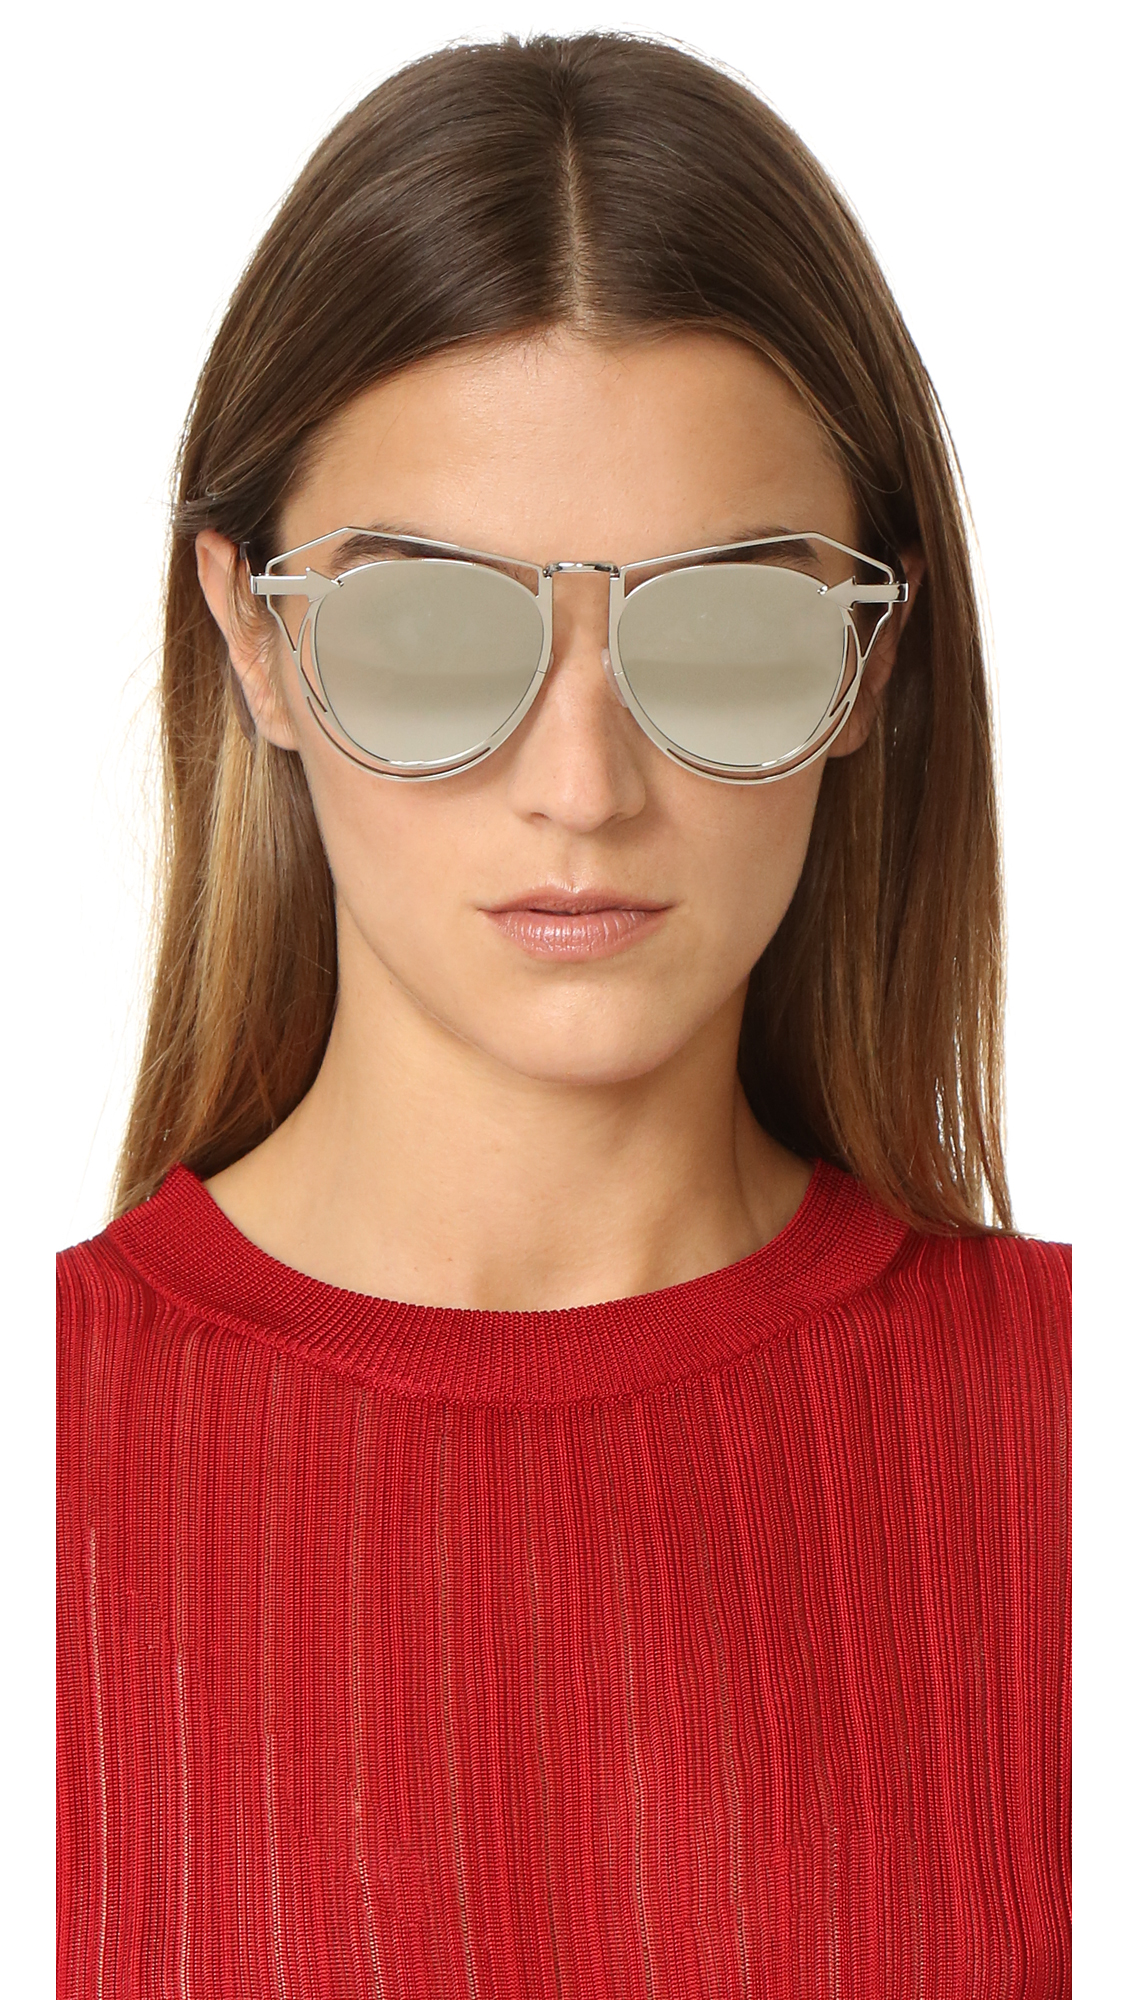 0a64e6221c0 Karen Walker Marguerite Sunglasses